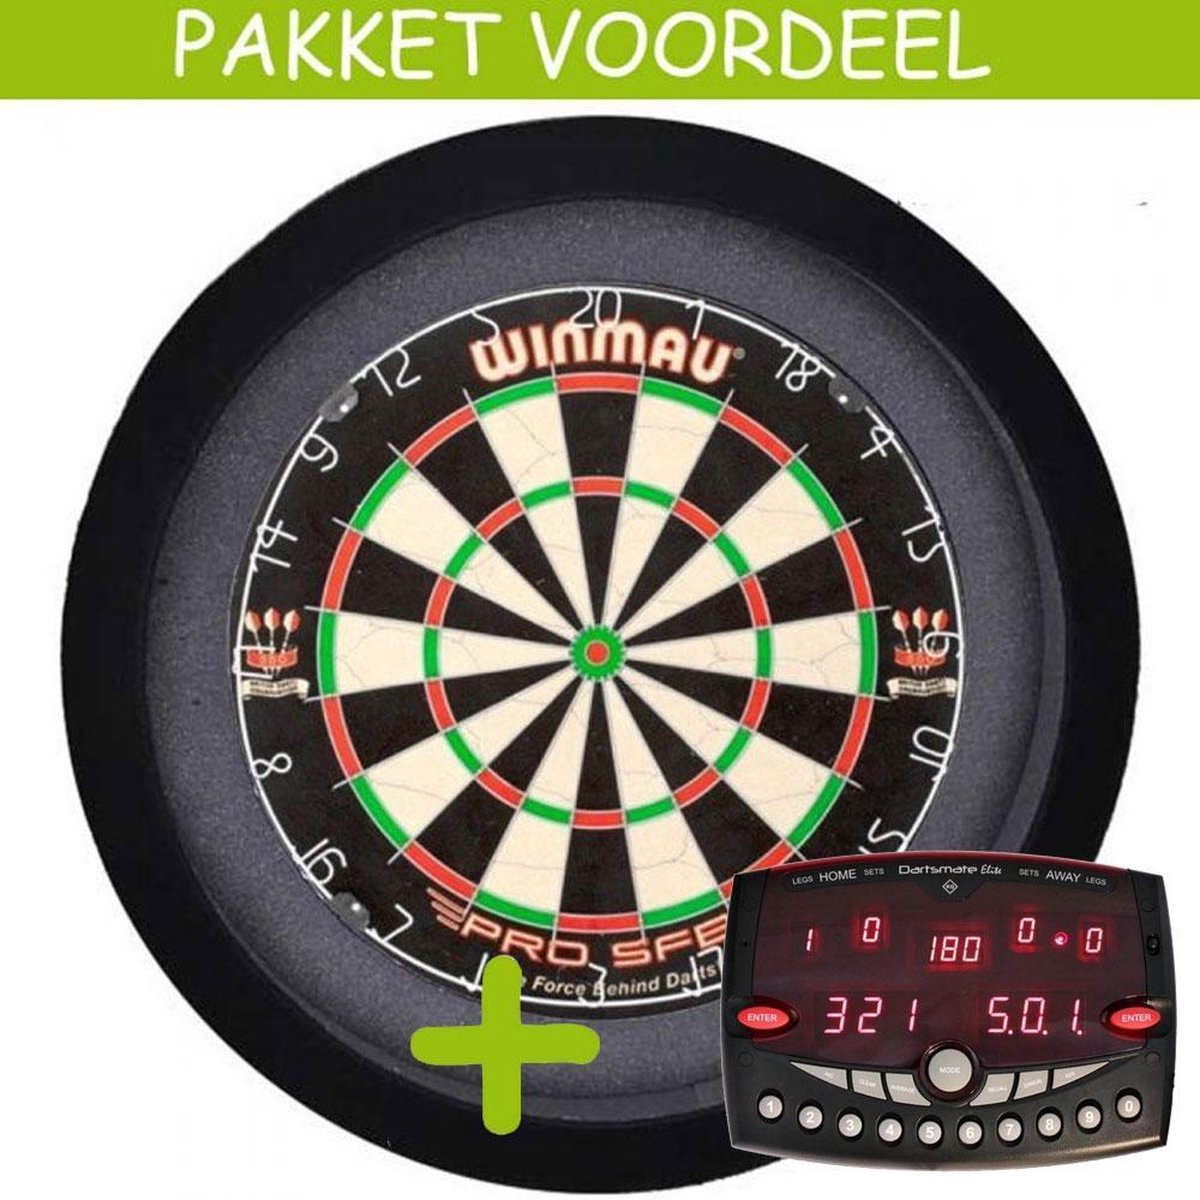 Elektronisch Dart Scorebord VoordeelPakket (Elite ) - Pro SFB - Dartbordverlichting Basic (Zwart)